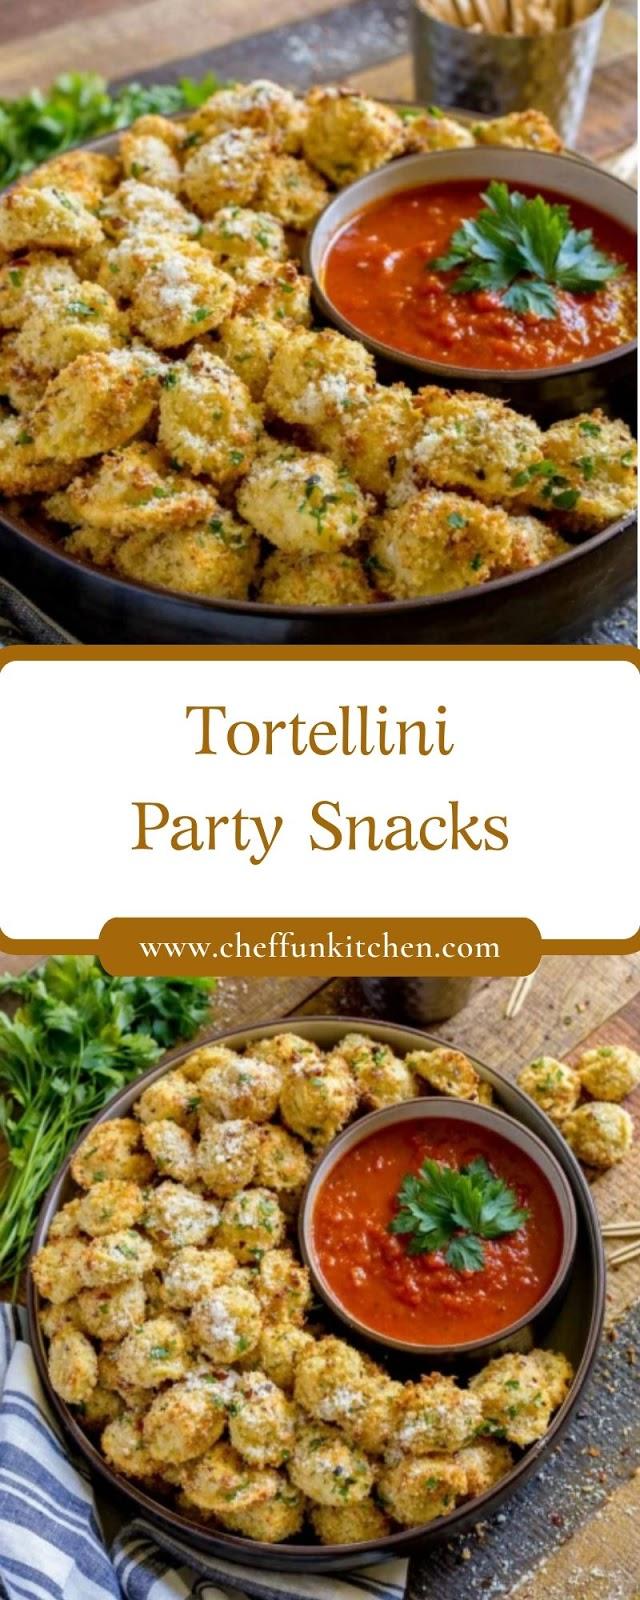 Tortellini Party Snacks